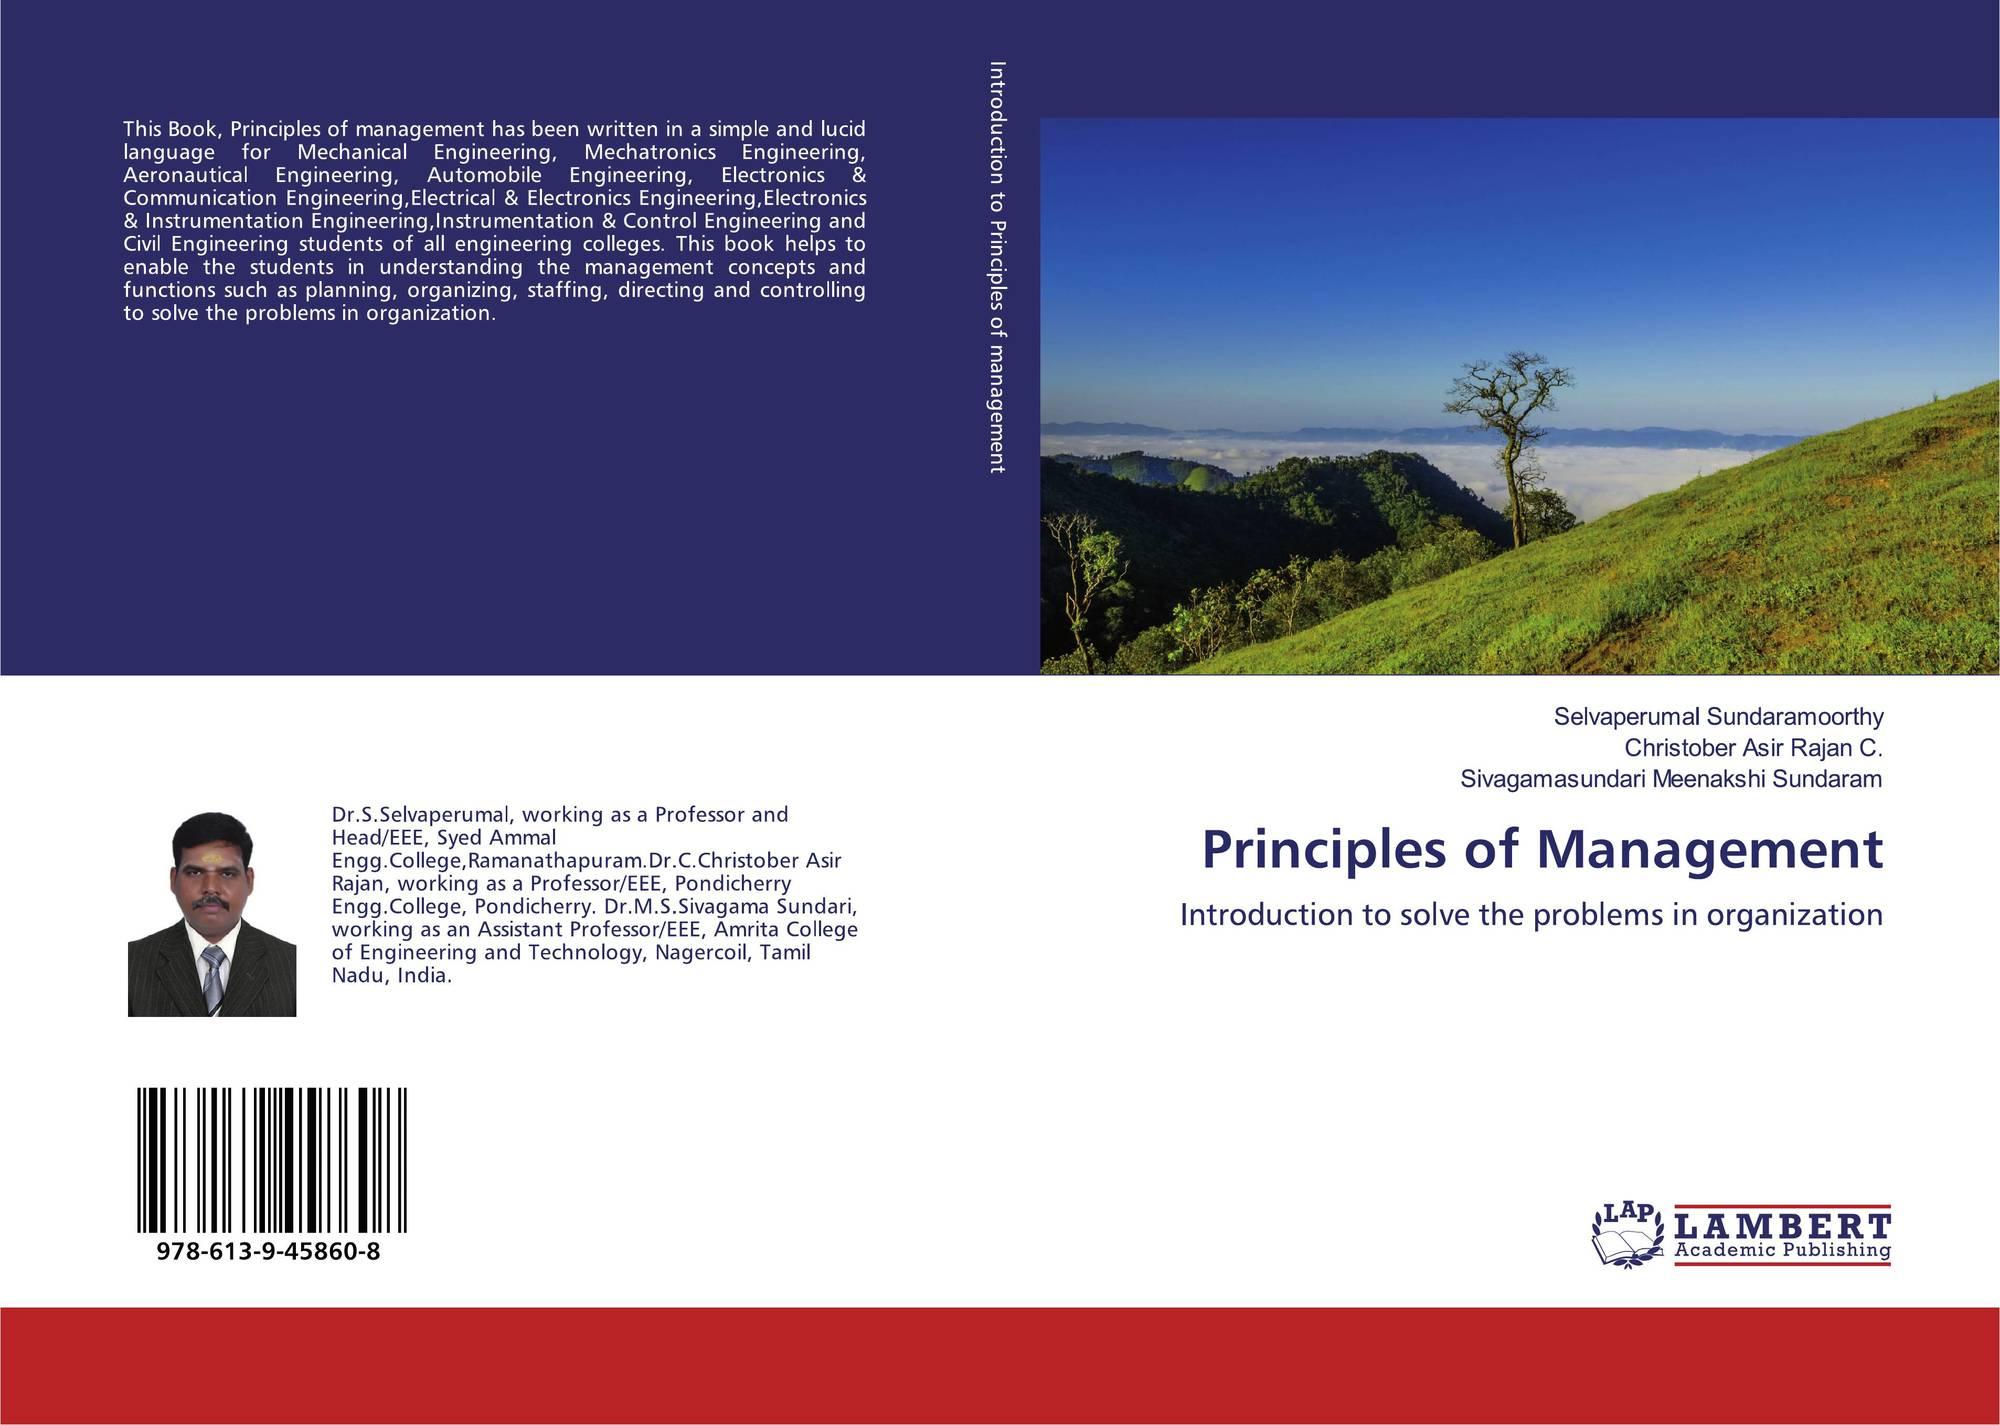 Principles of Management, 978-613-9-45860-8, 6139458609